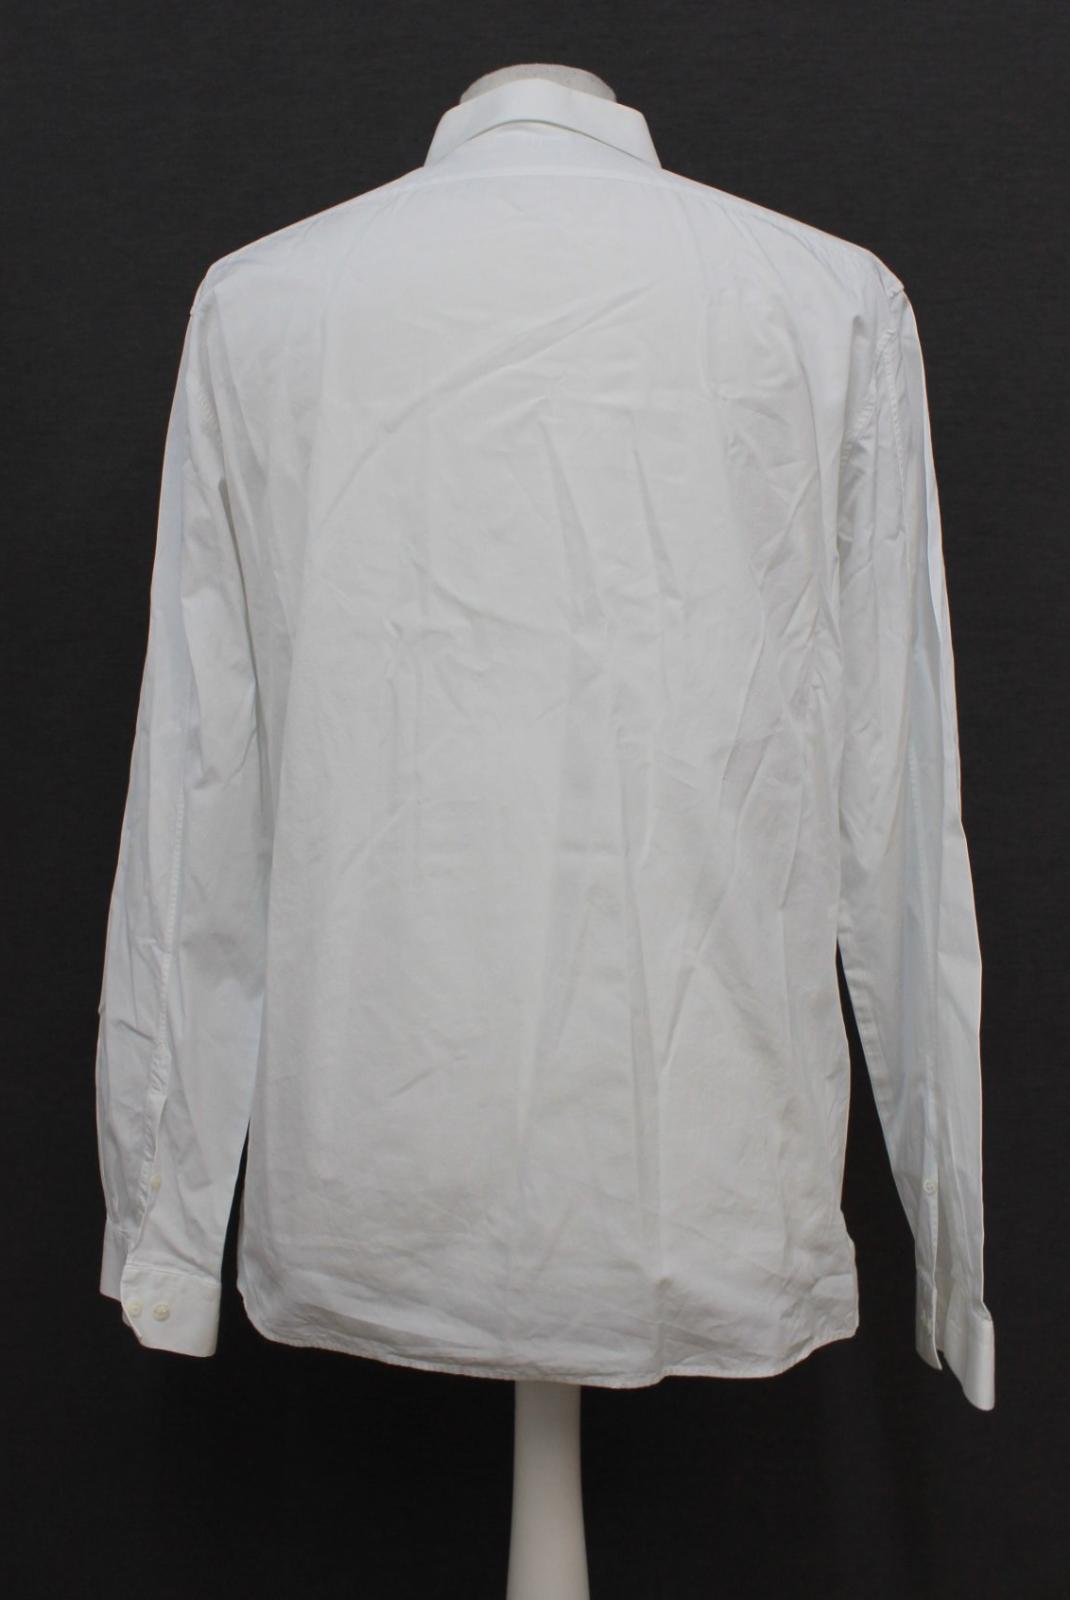 Neil-Barrett-para-hombre-calce-cenido-de-algodon-blanco-cuello-flash-camisa-de-manga-larga-talla-17 miniatura 5